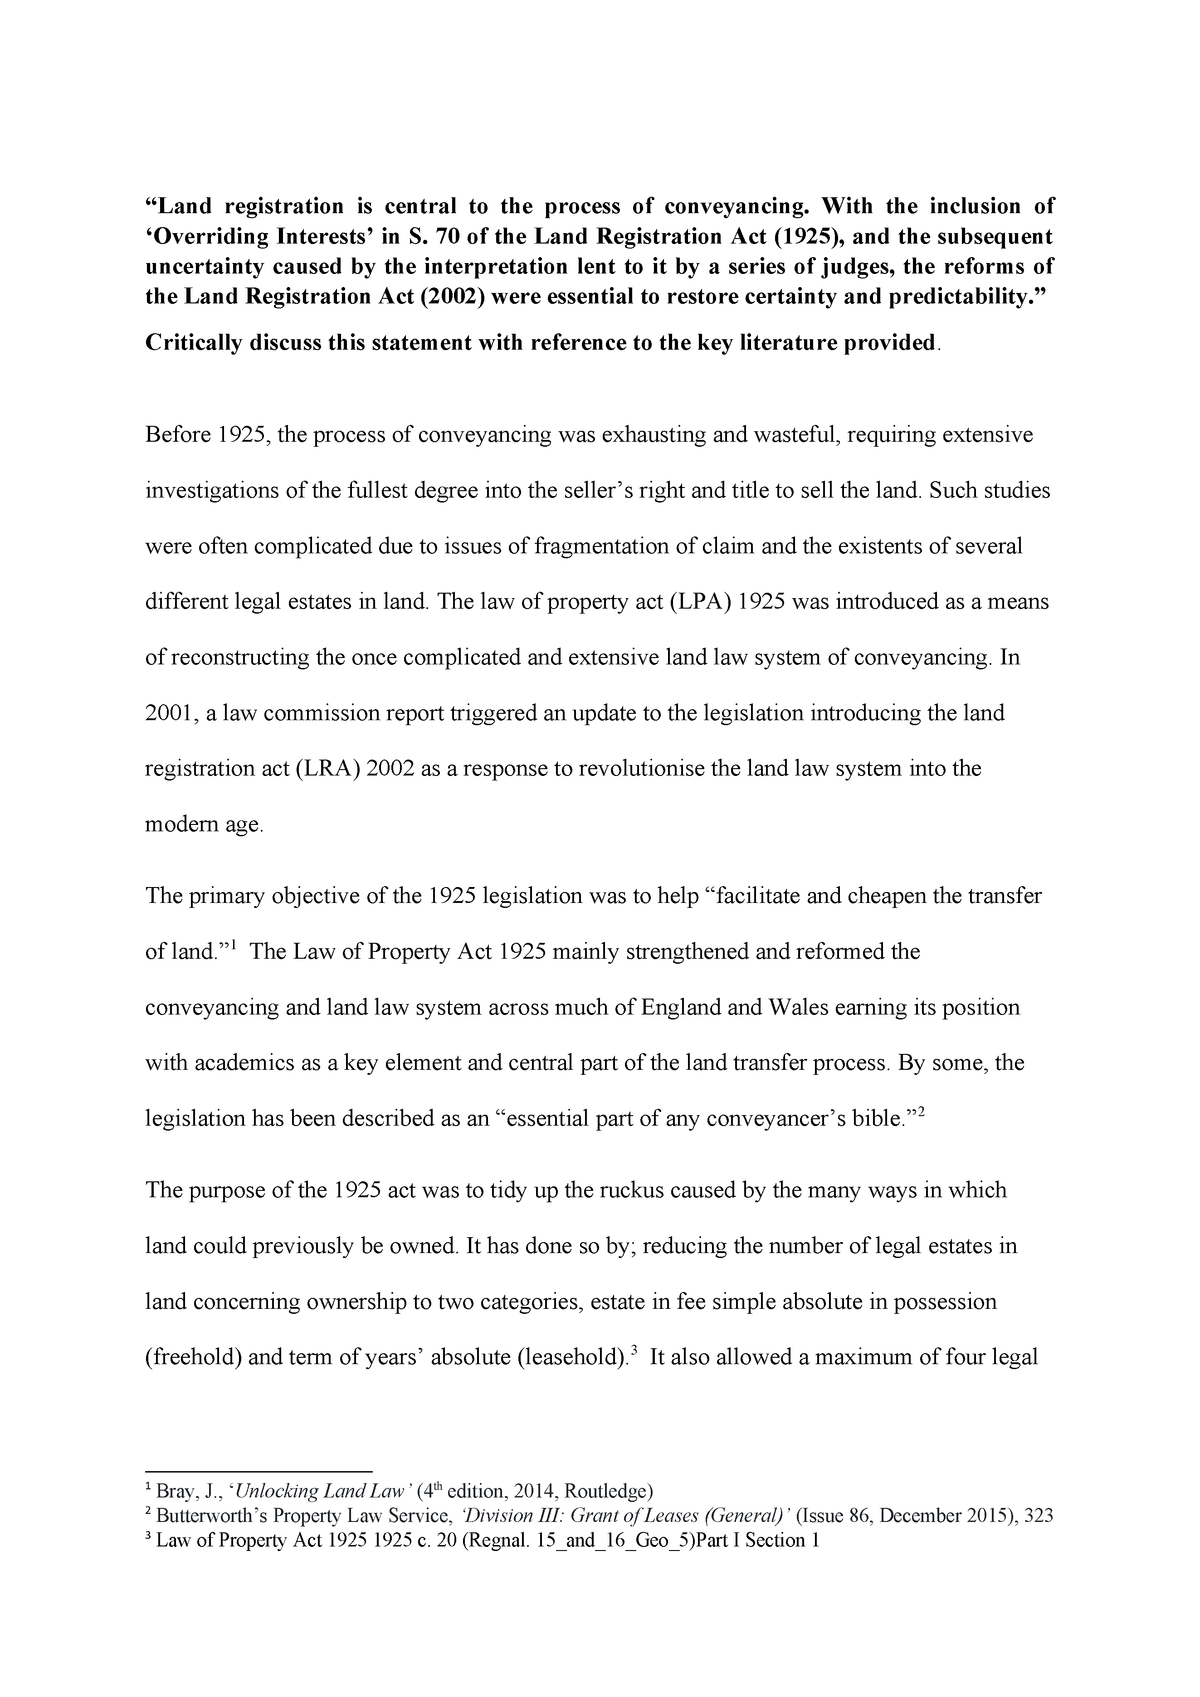 Land law essay final copy - Land Law LLBP 2205 - DMU - StuDocu